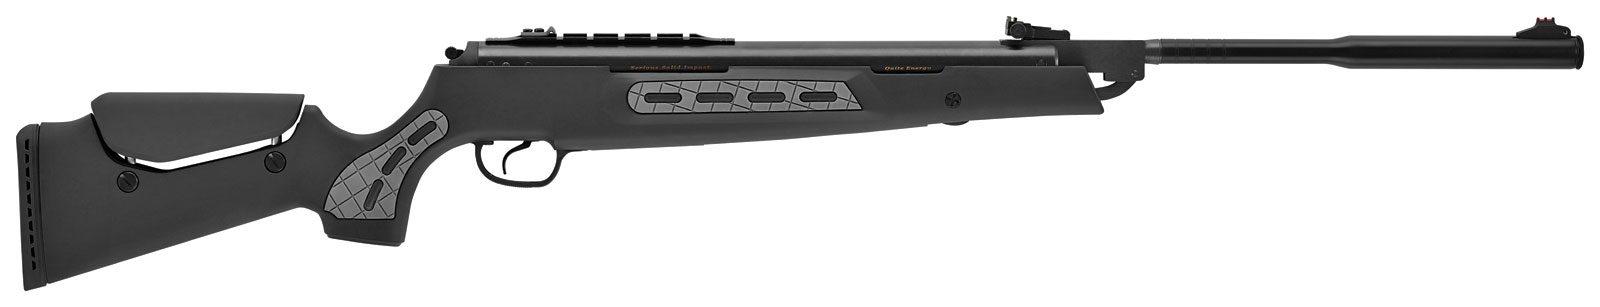 MOD 135QE Sniper